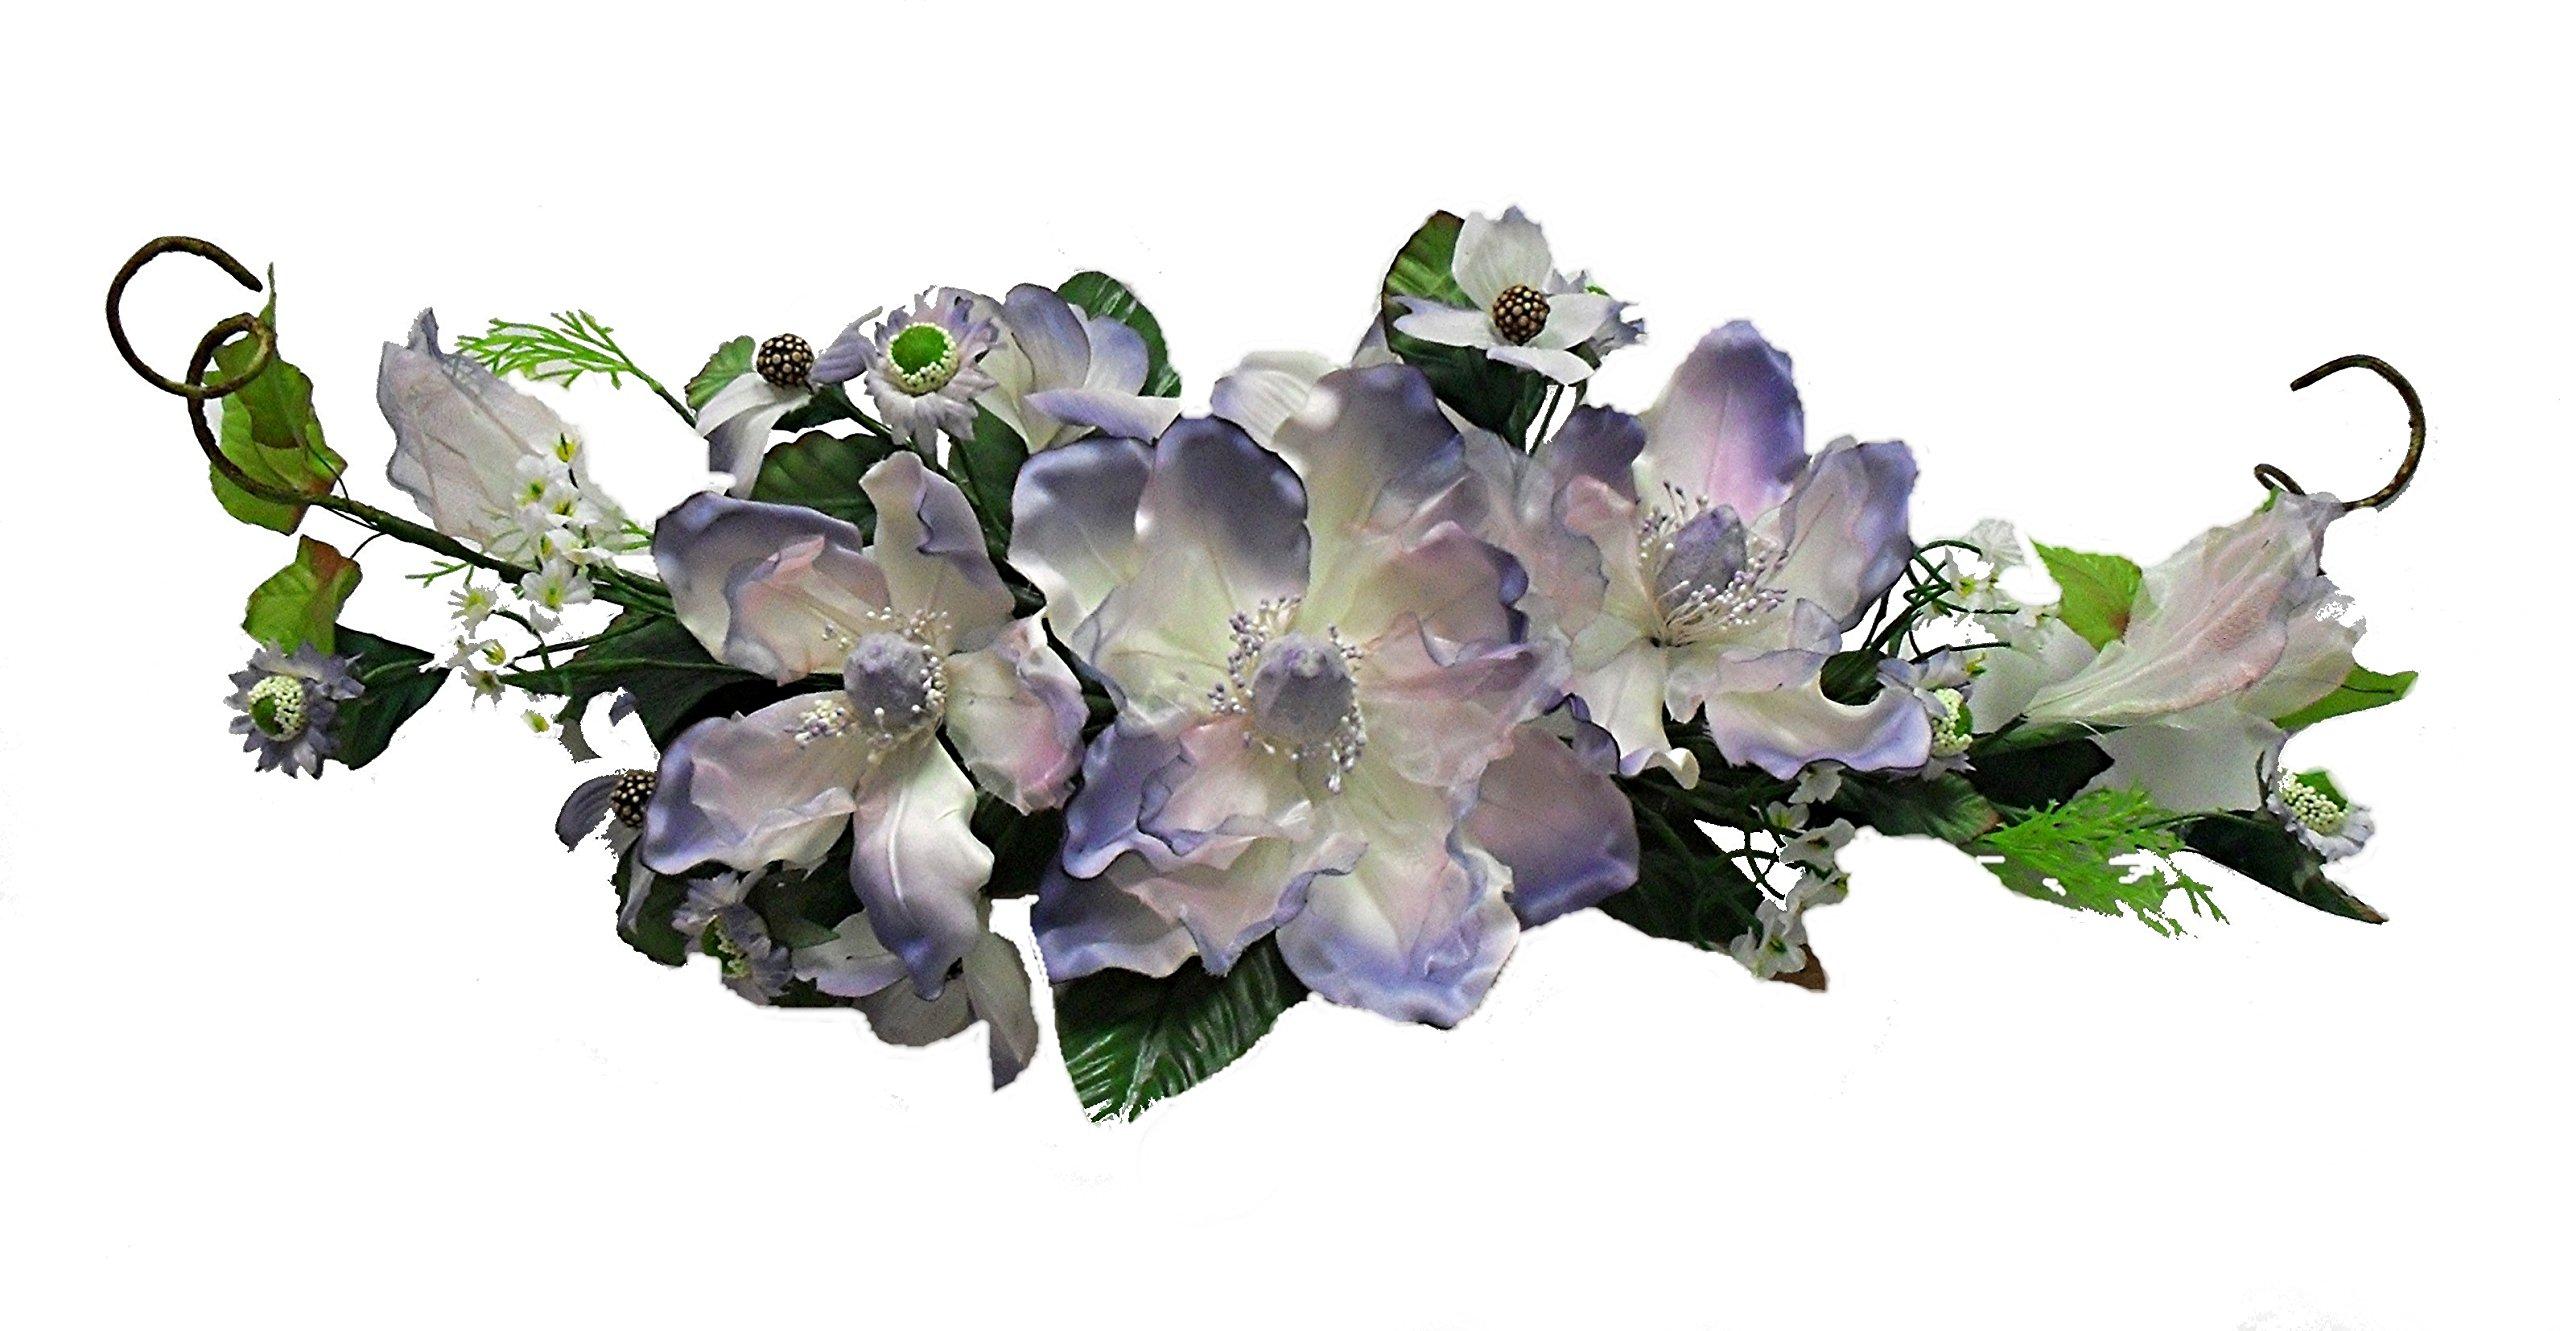 Wholesale Silk Floral Crinkle/Sheer Magnolia Swag, 26'', Lavender